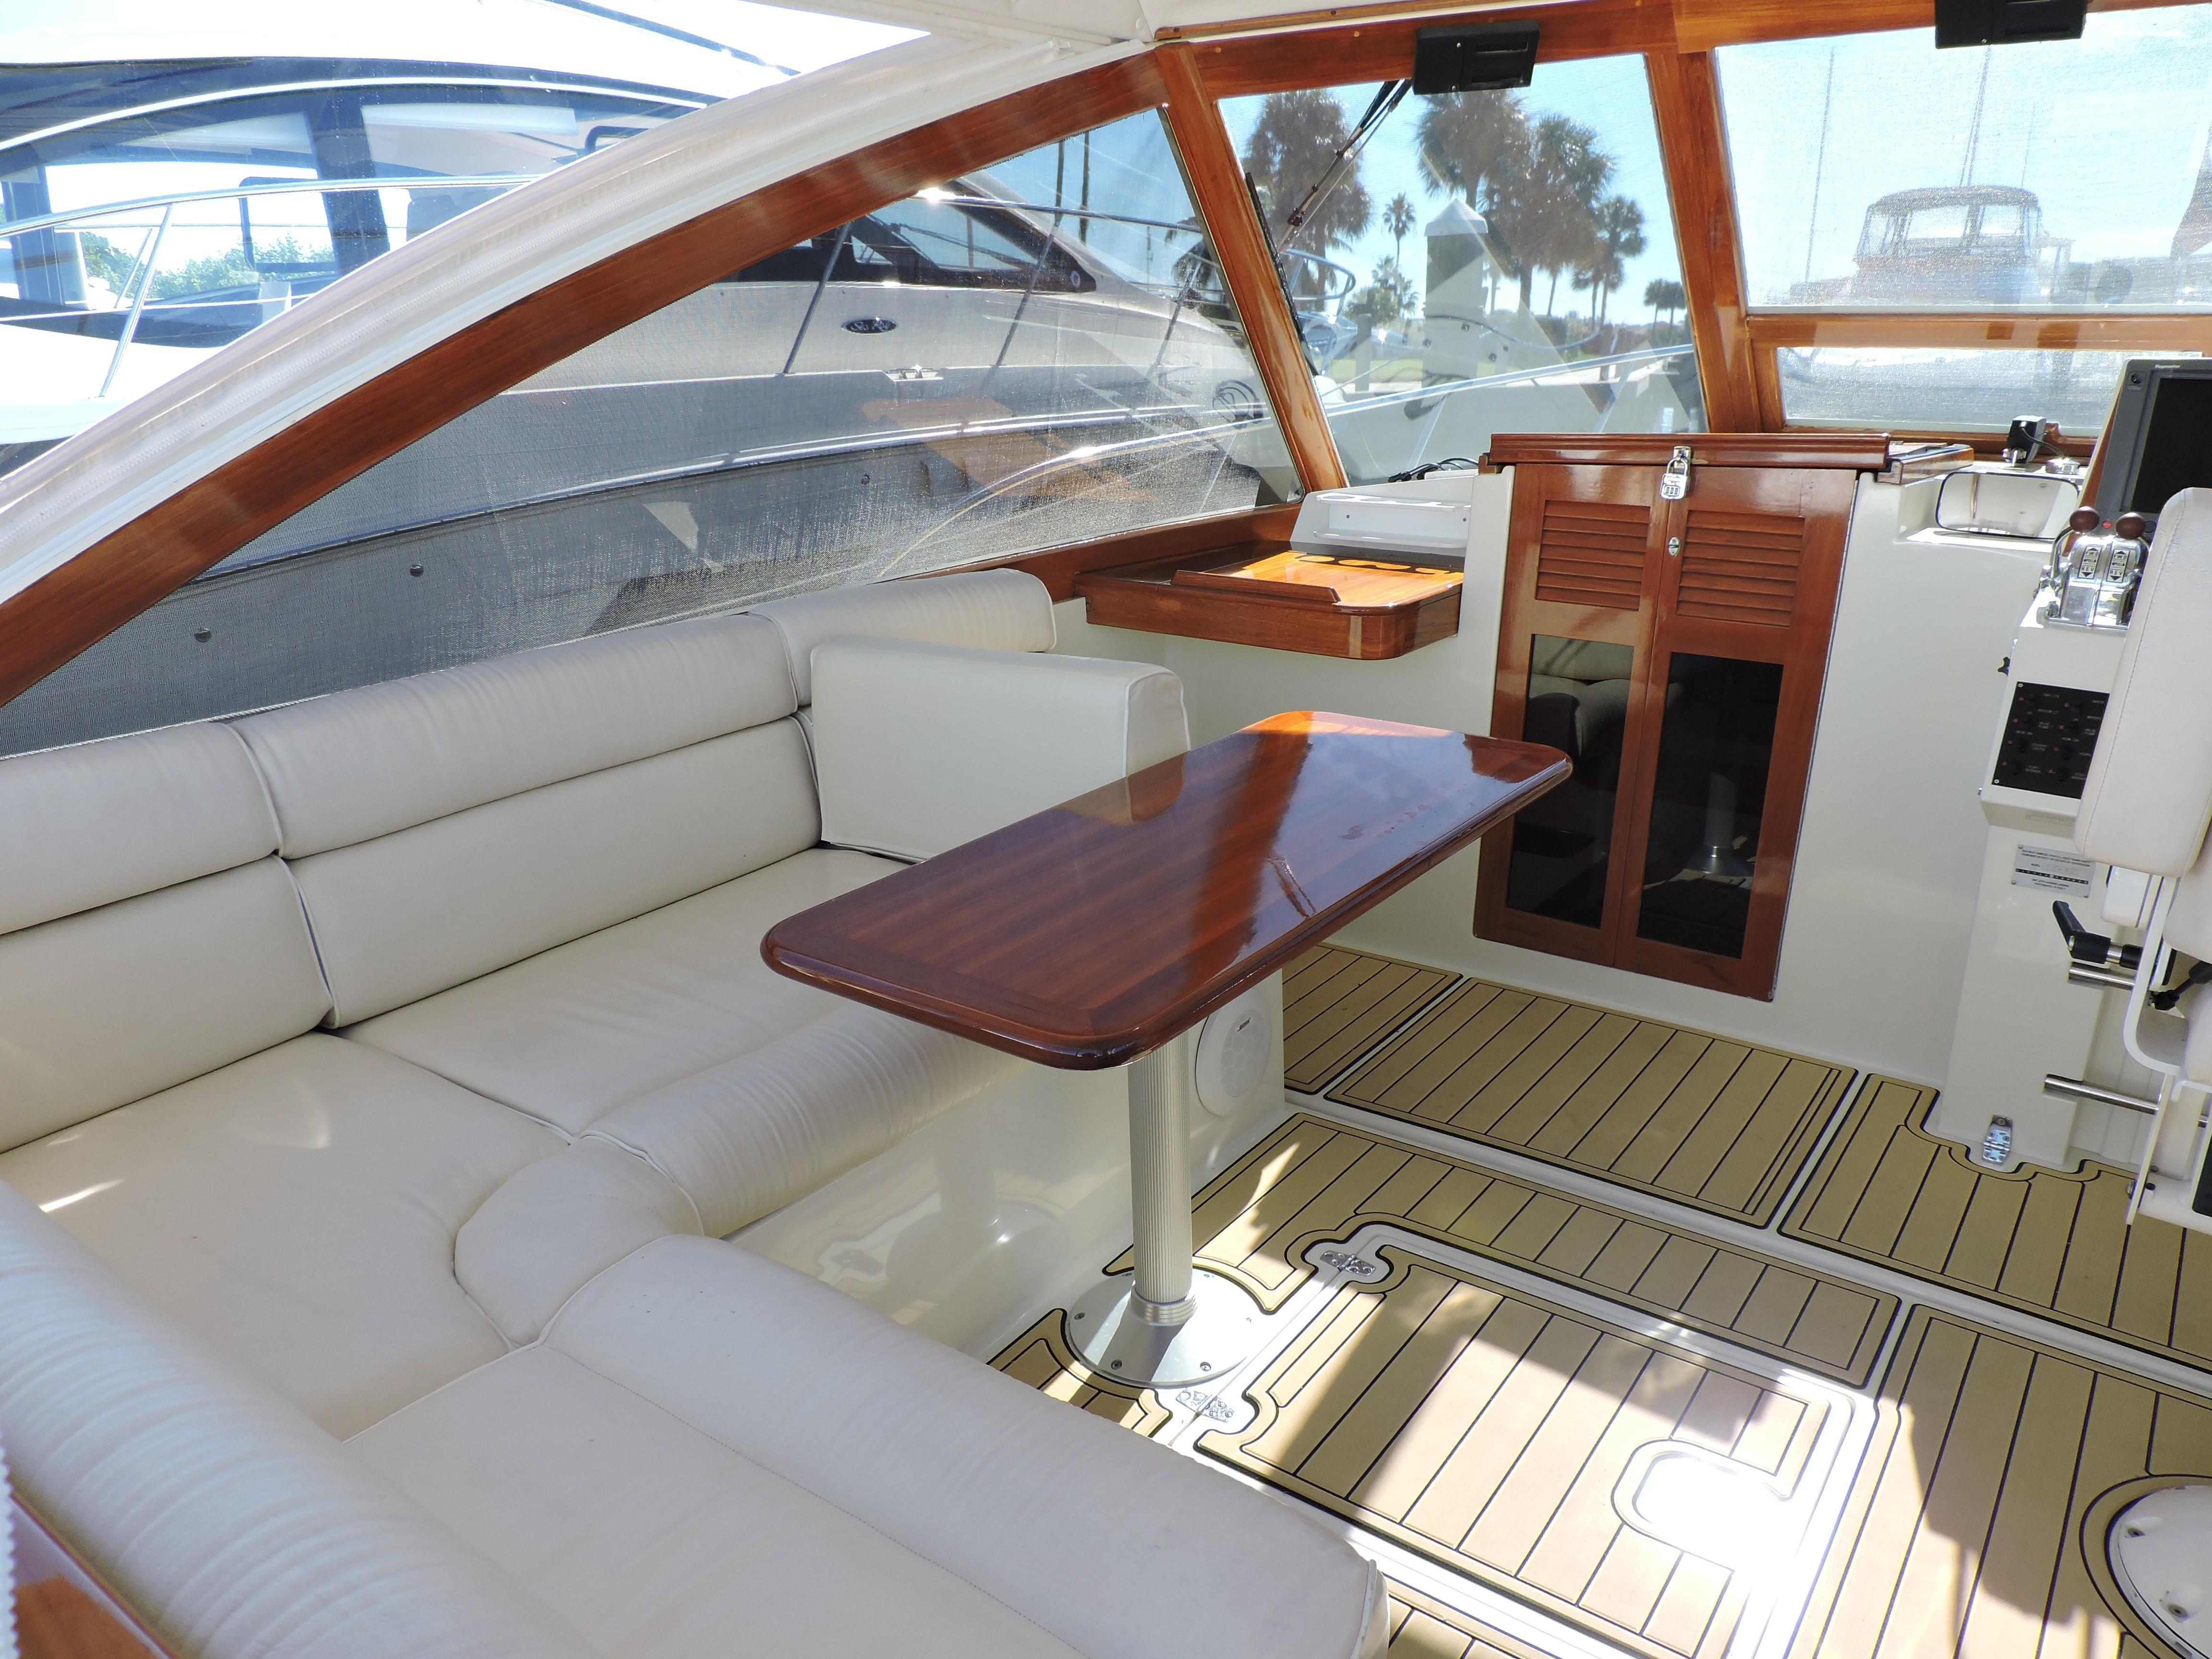 36 Little Harbor Jim Dandy 2002 Longboat Key/Sarasota | Denison Yacht Sales